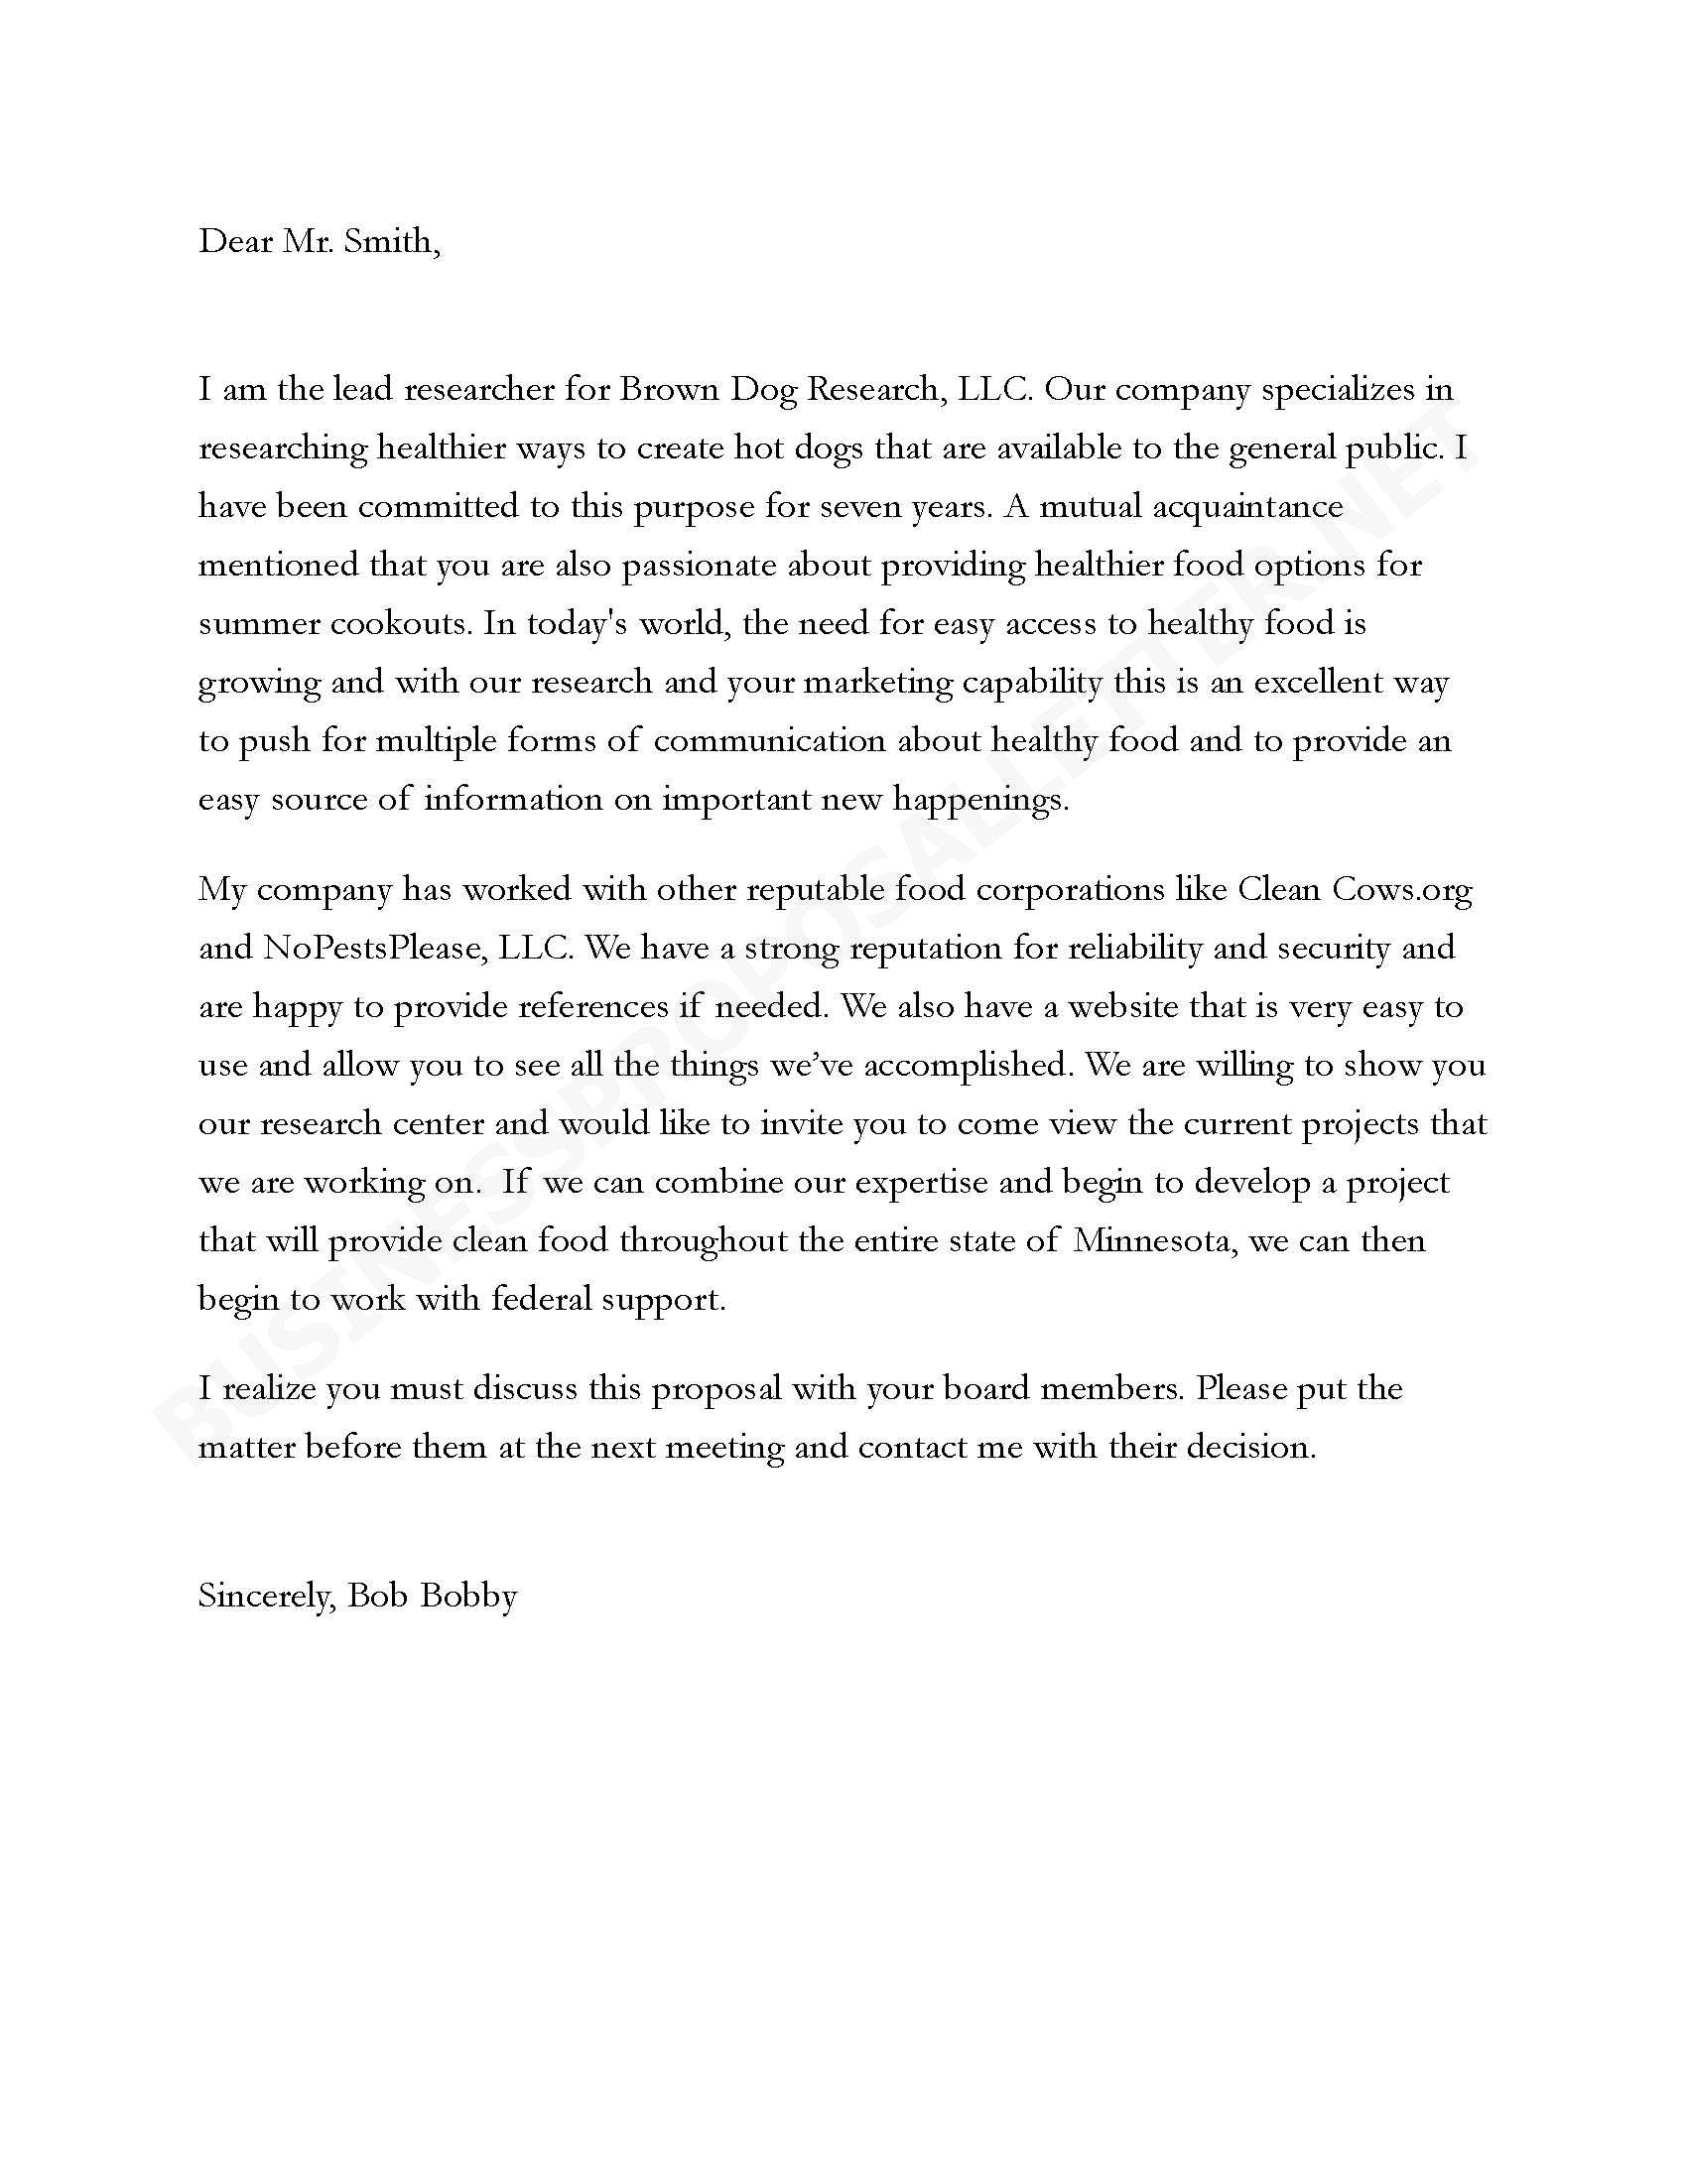 005 Essay Proposal Business Letter Sample Top Samples Mla Format Satirical Ideas Full